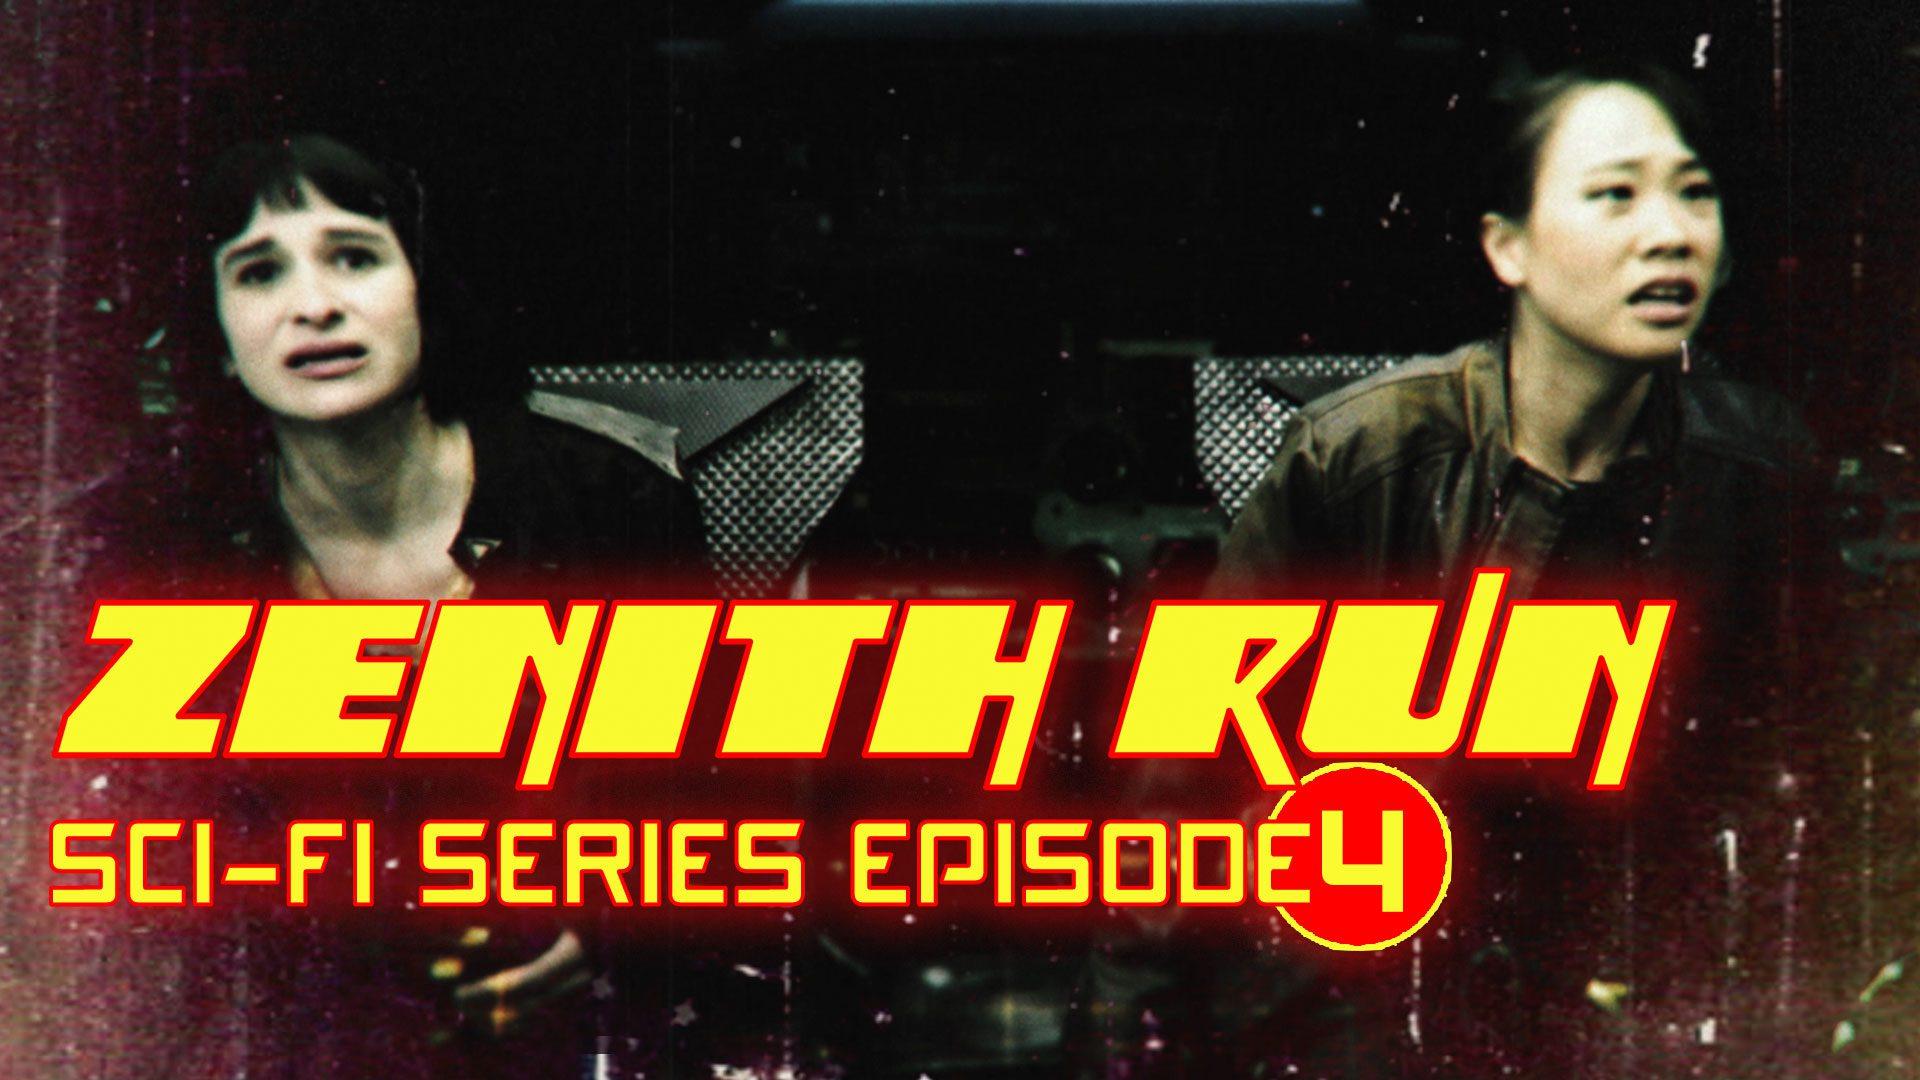 Zenith Run Episode 4